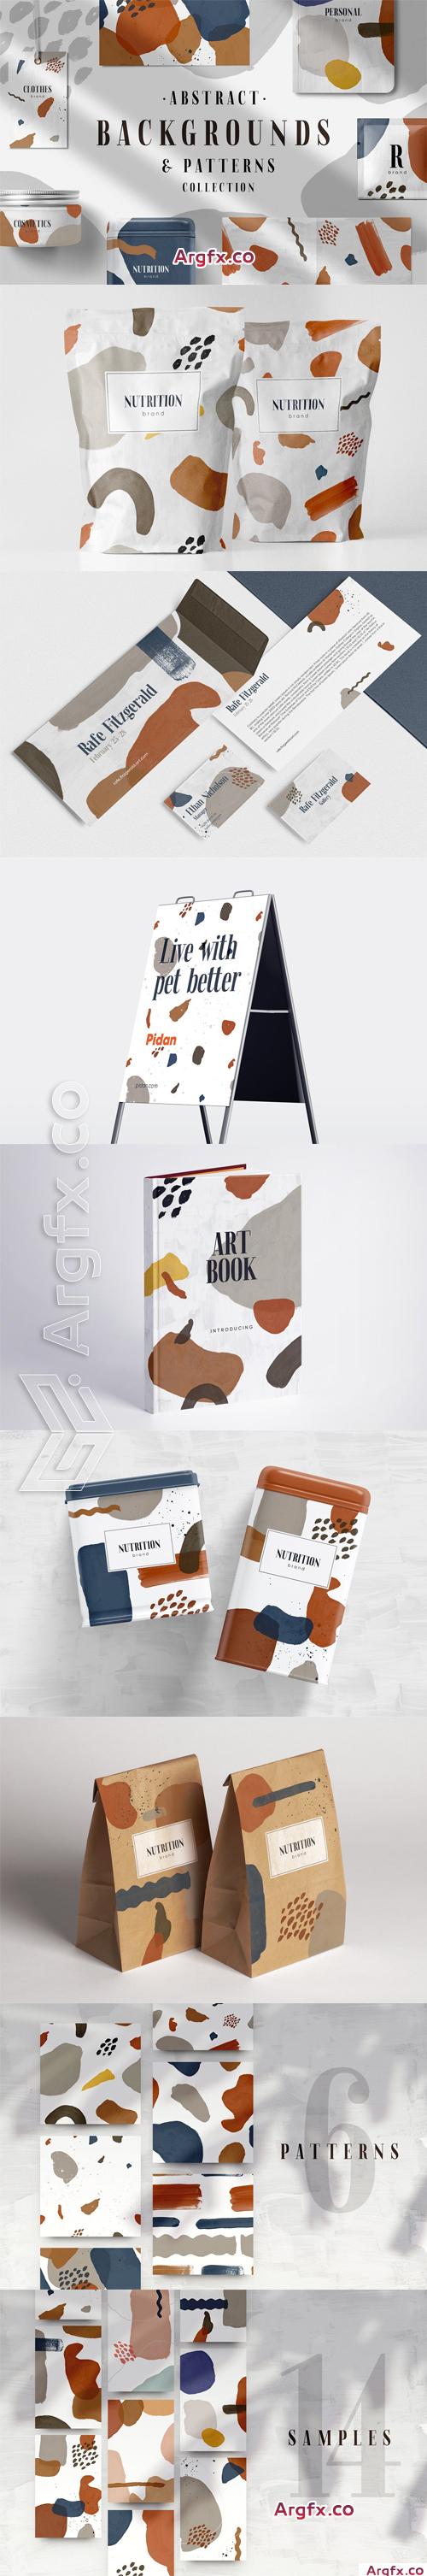 Abstract Patterns & Backs